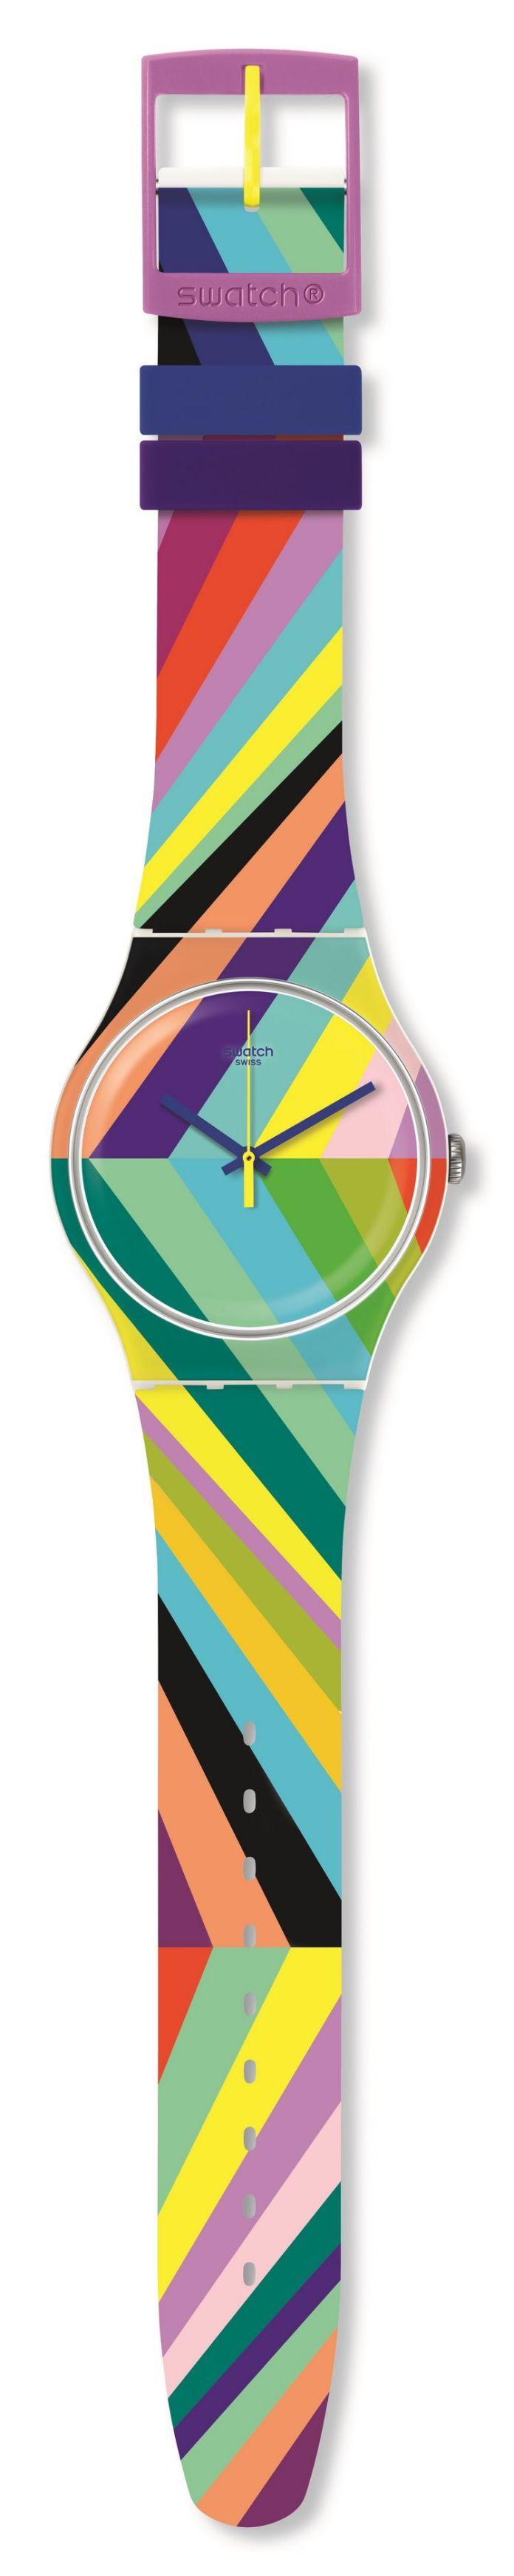 Swatch Stardust & Color Blocks